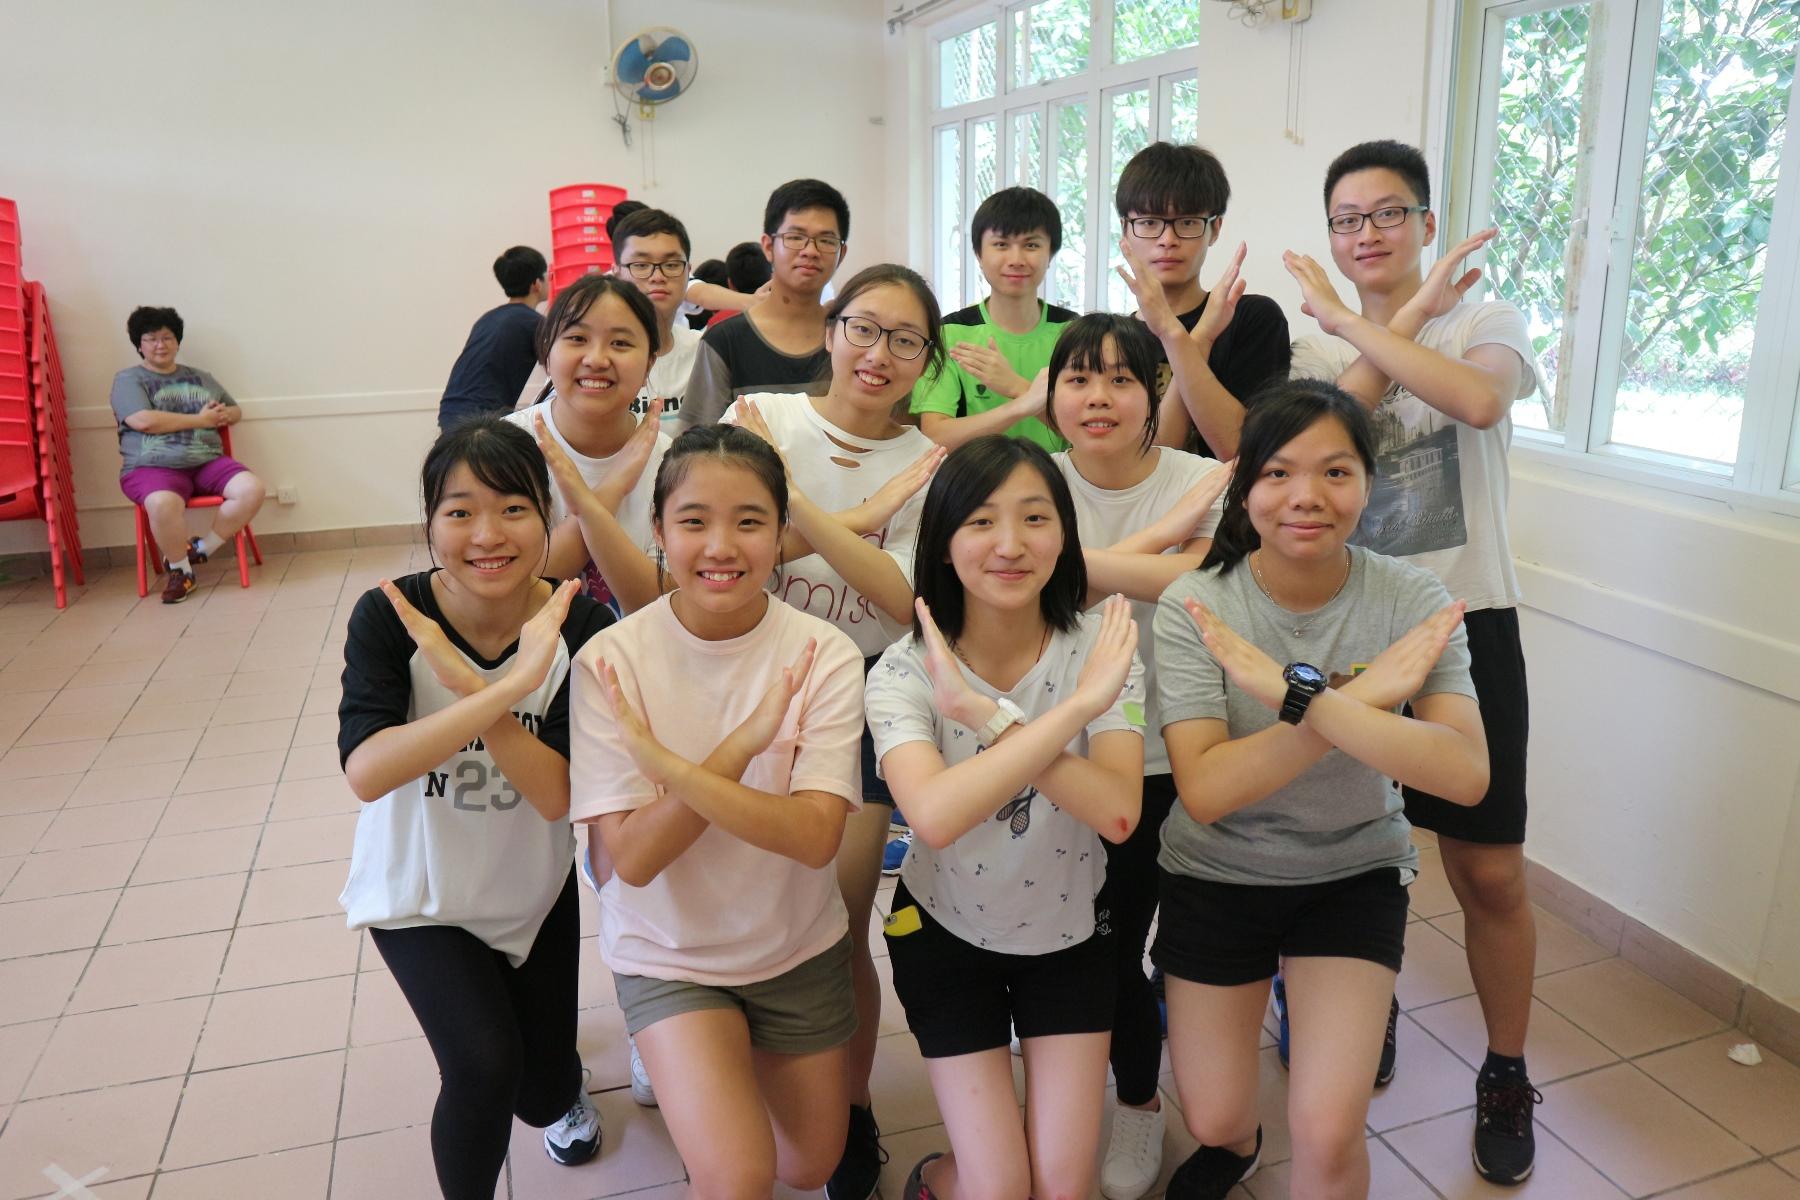 http://www.npc.edu.hk/sites/default/files/img_3399_1.jpg